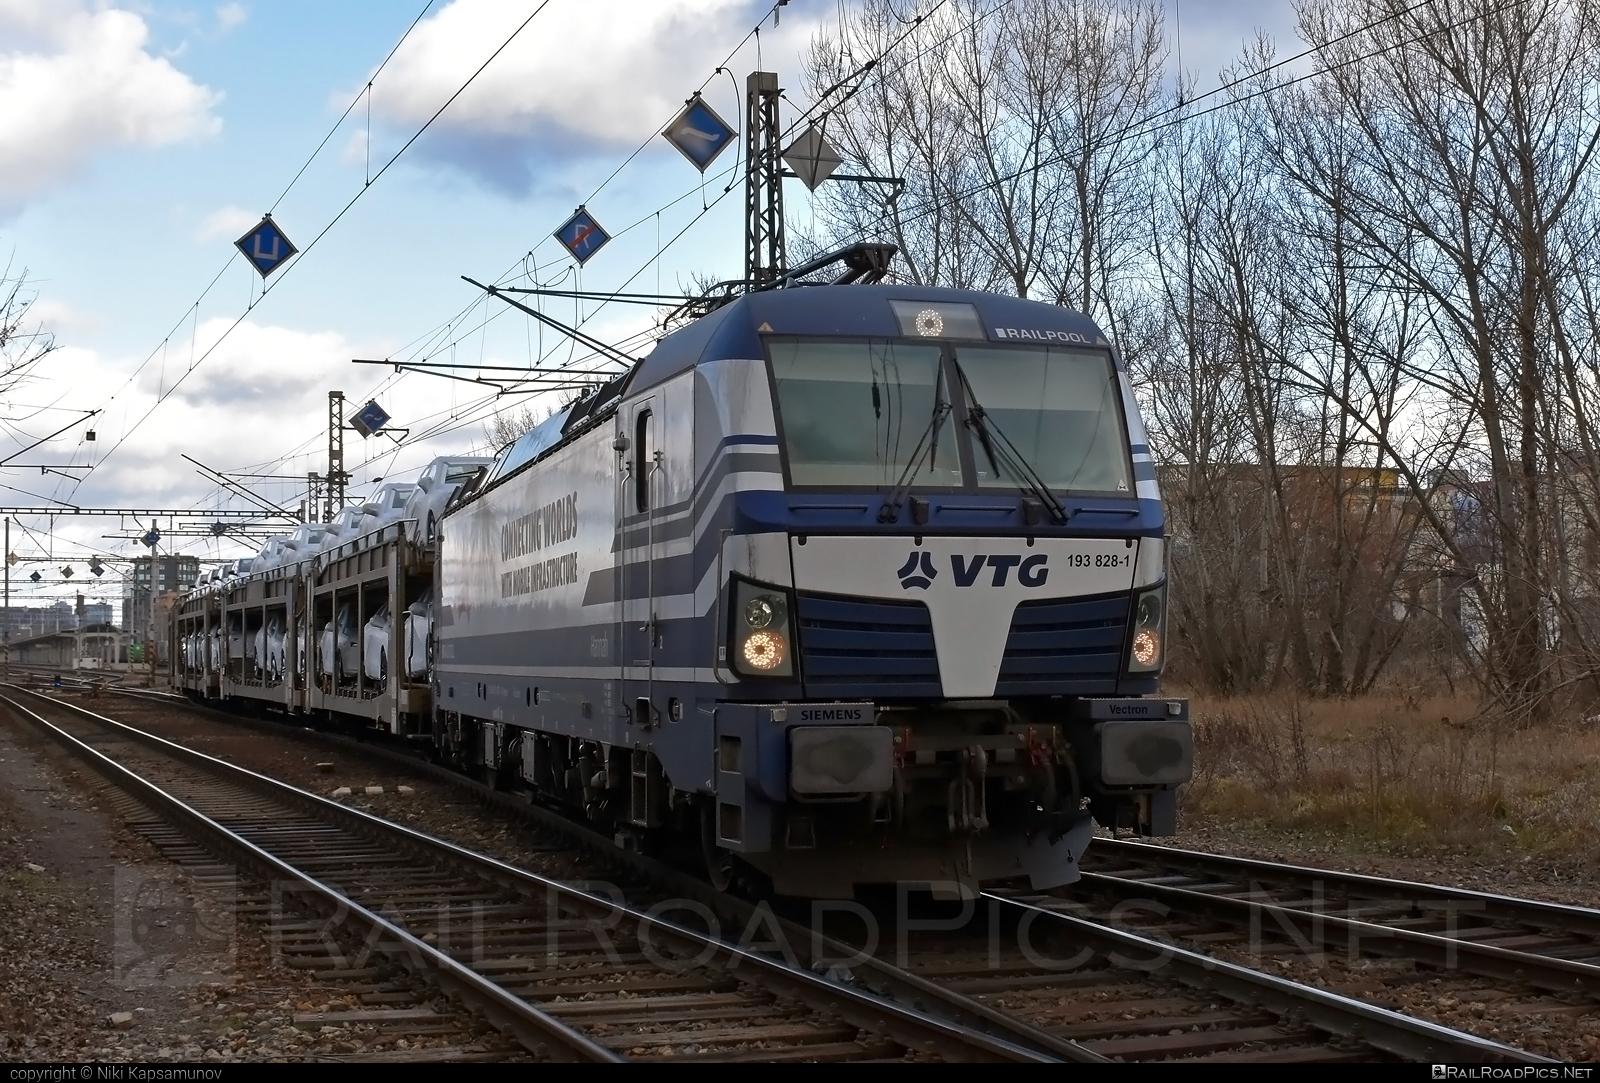 Siemens Vectron AC - 193 828-1 operated by Retrack GmbH & Co. KG #blg #carcarrierwagon #laaers #railpool #railpoolgmbh #retrack #retrackgmbh #siemens #siemensvectron #siemensvectronac #vectron #vectronac #vtg